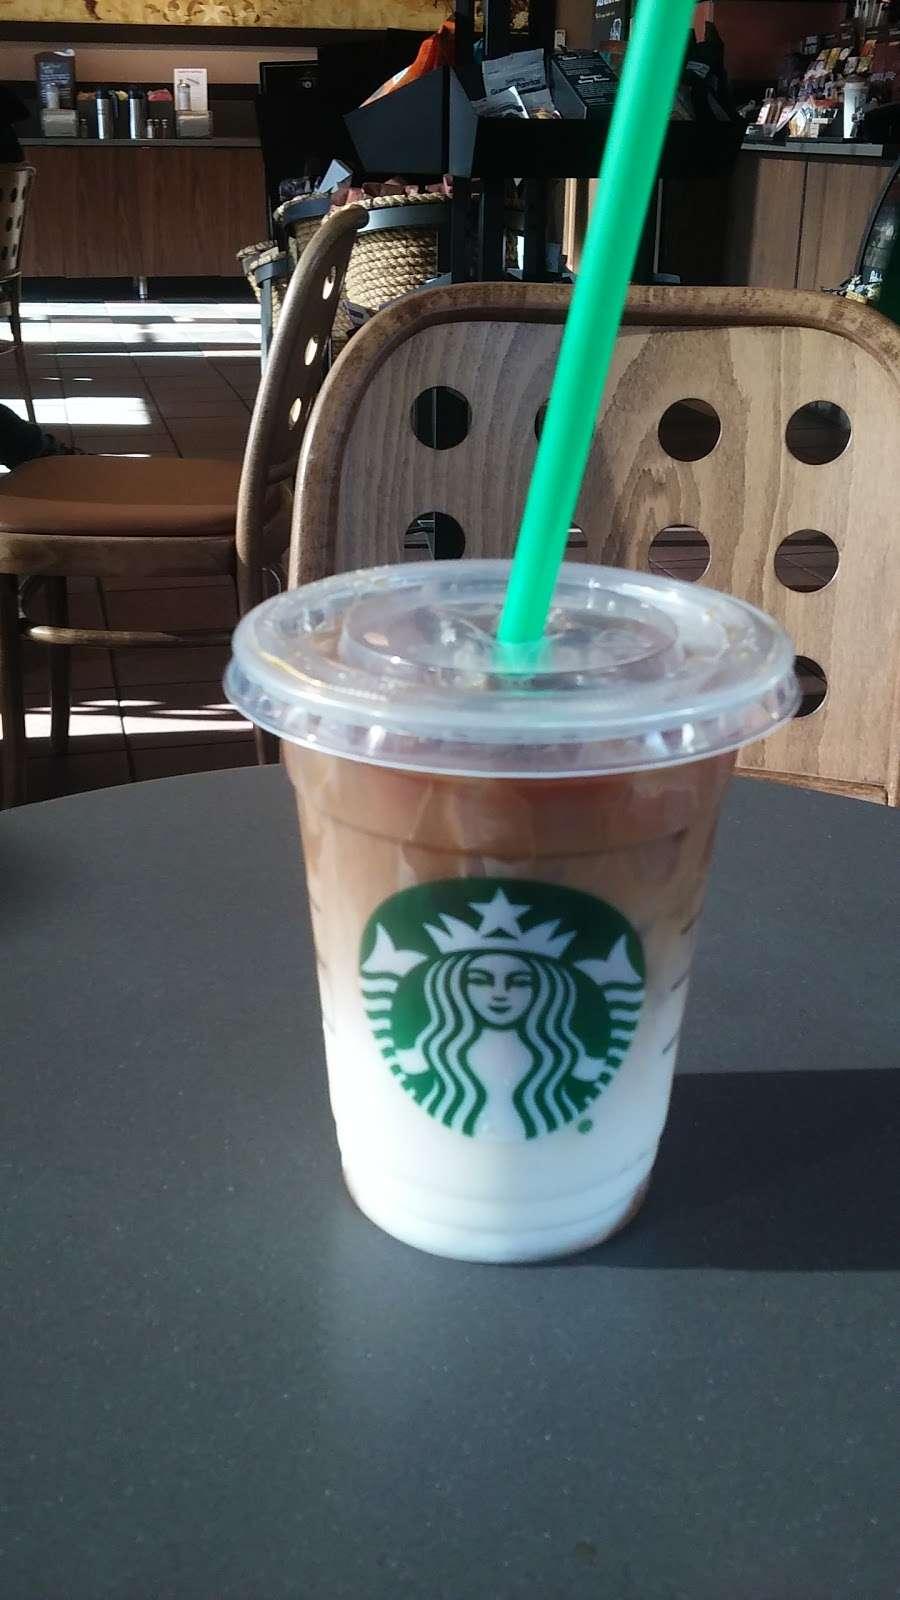 Starbucks - cafe  | Photo 5 of 10 | Address: 1336 Peninsula Blvd, Hewlett, NY 11557, USA | Phone: (516) 295-3330